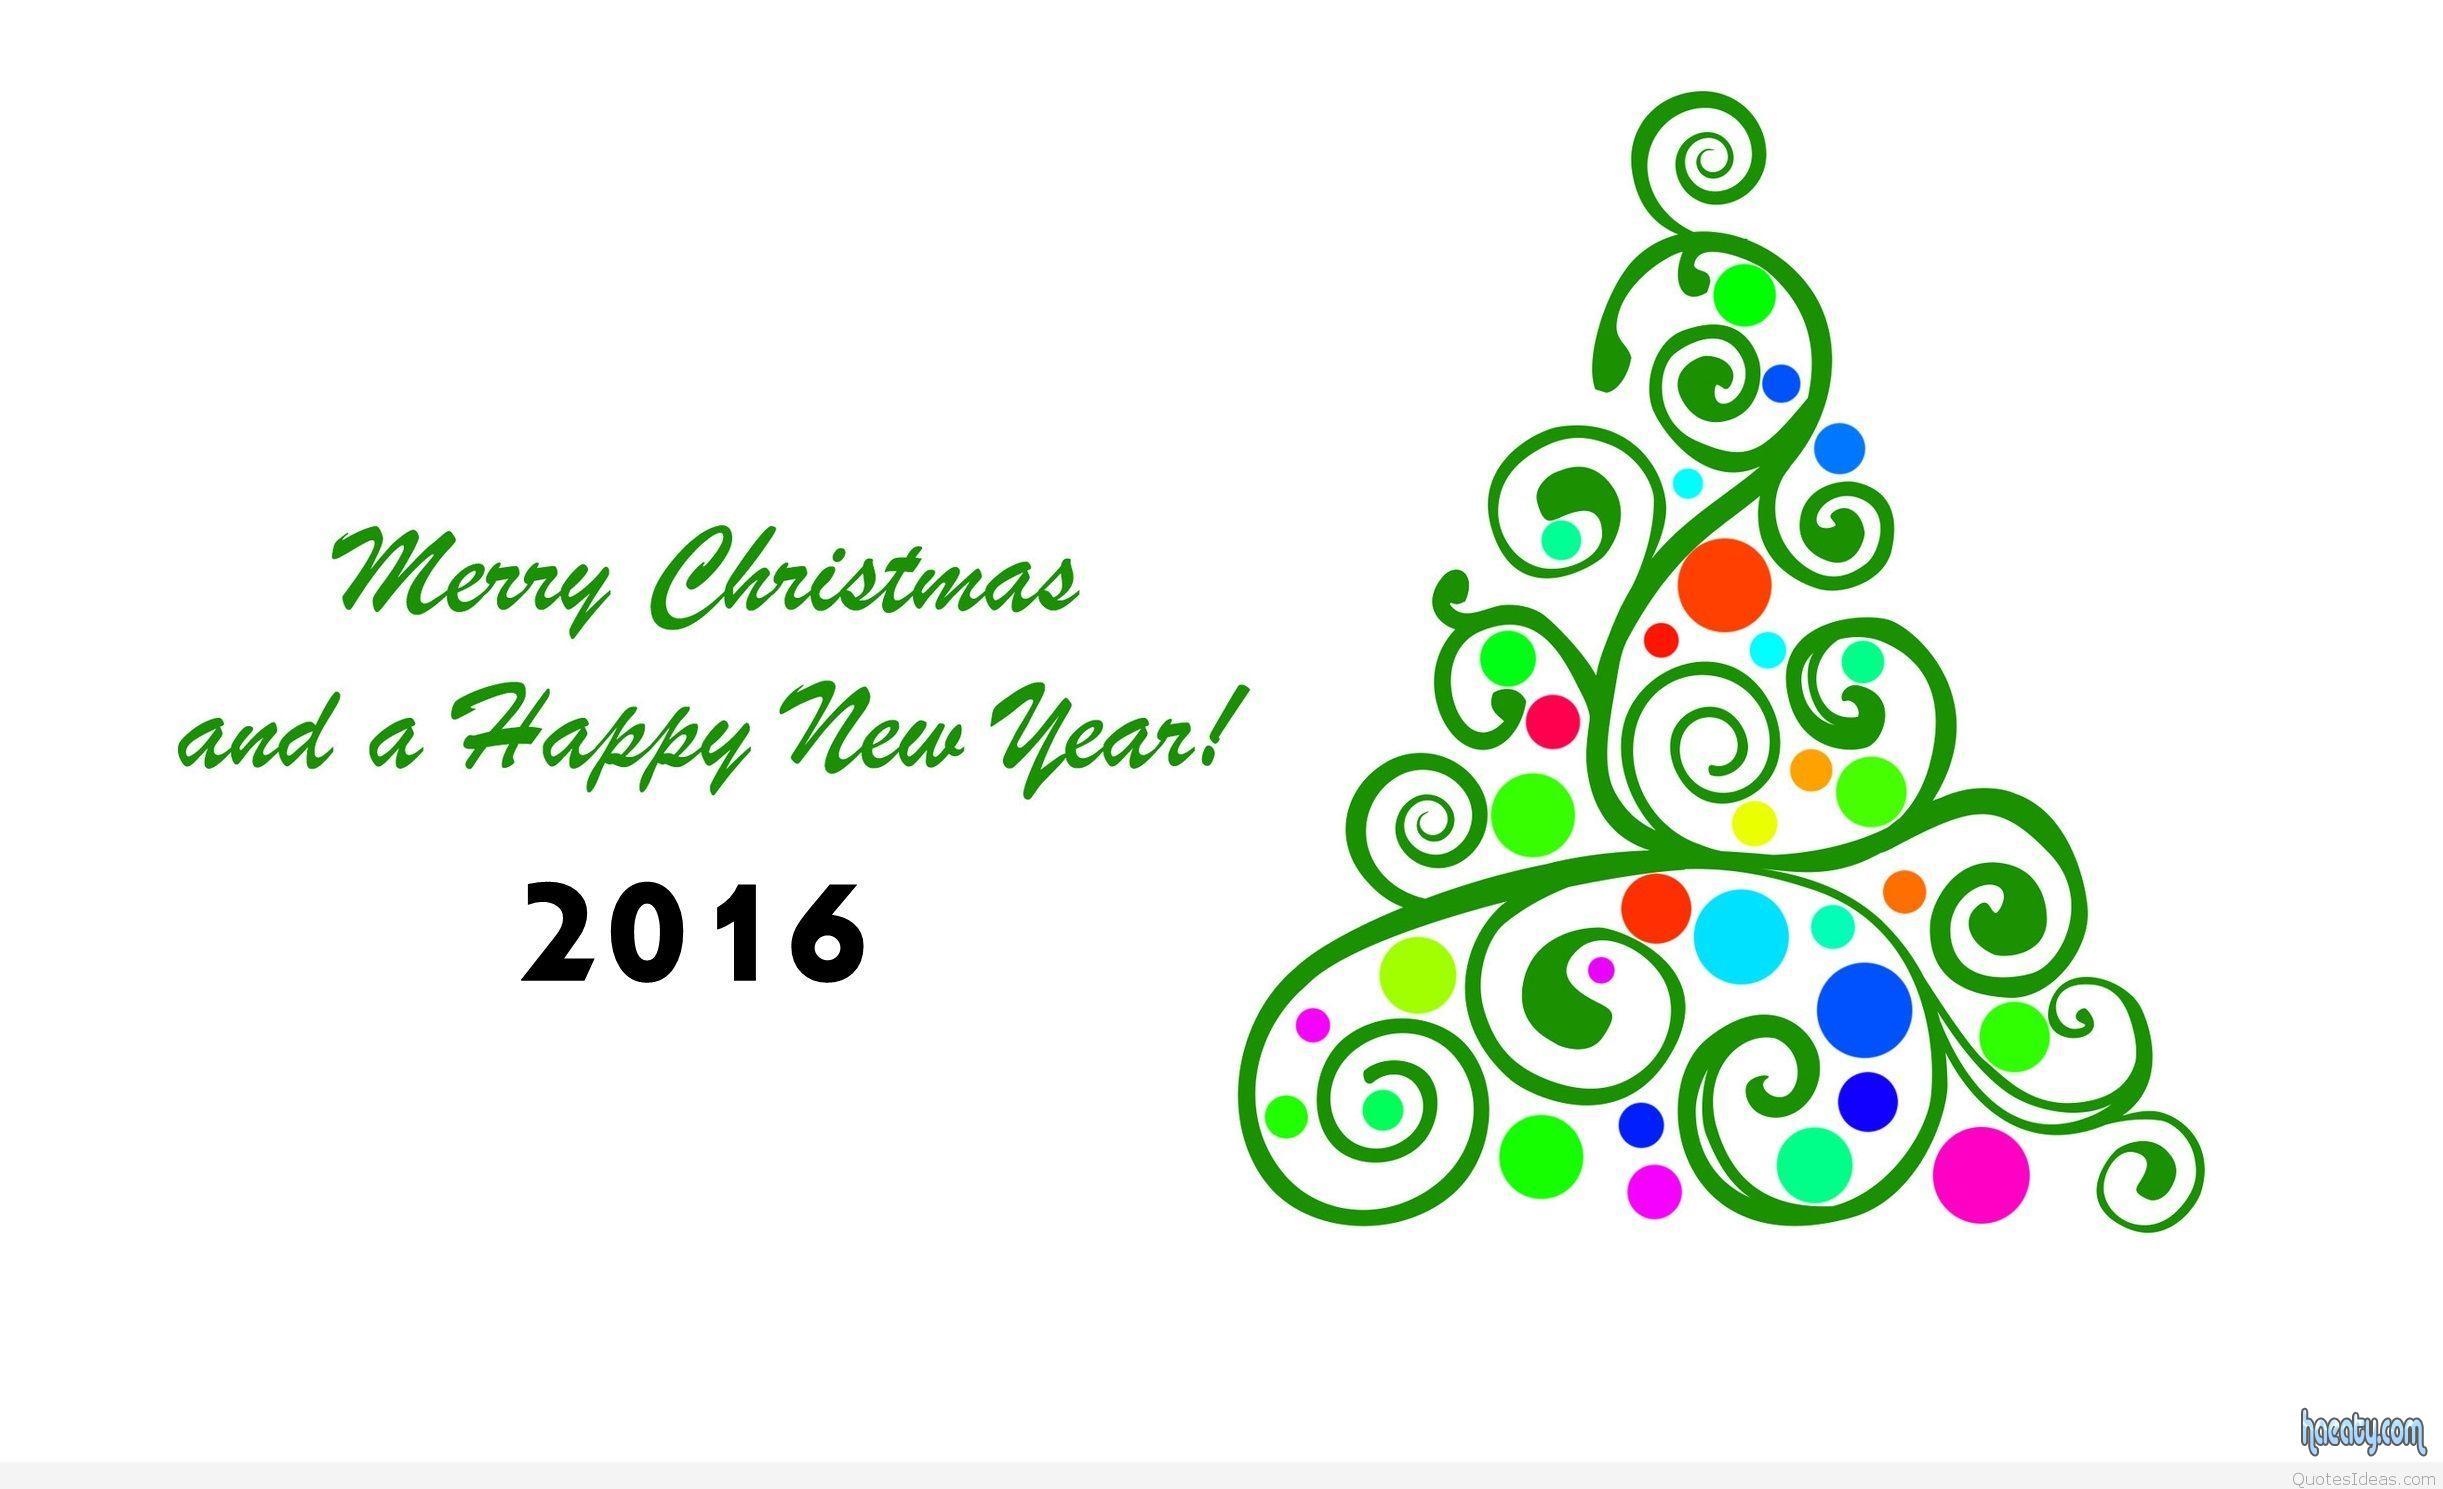 الكريسماس 2016-Merry-Christmas-and-Happy-new-year-2016 1450540134081.jpg